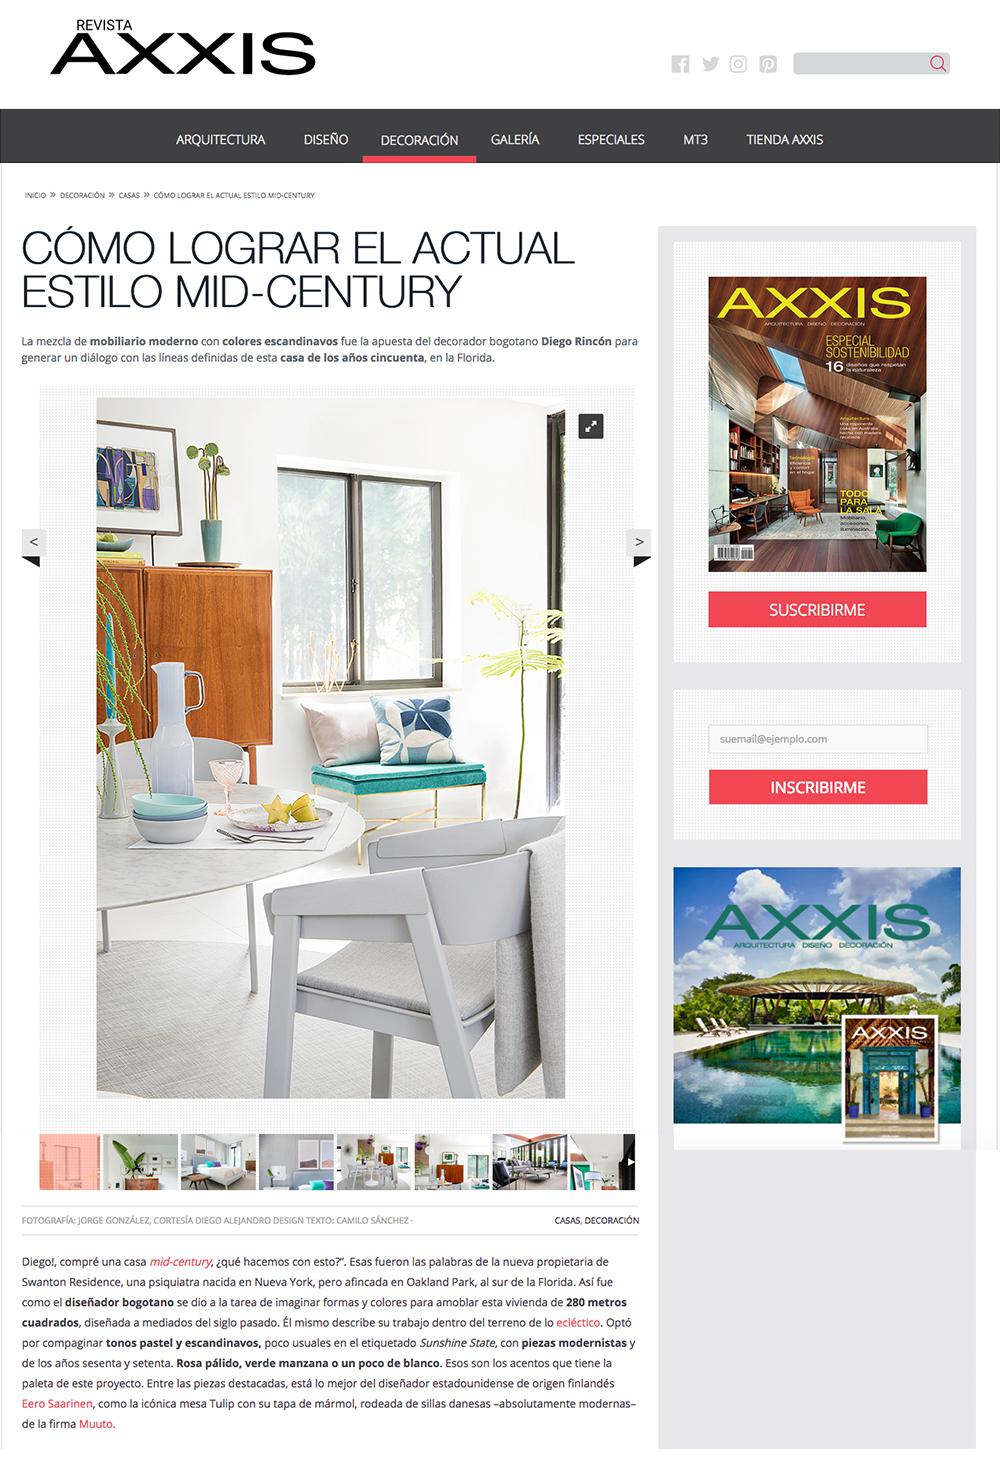 Axxis_Online_Article-1.jpg